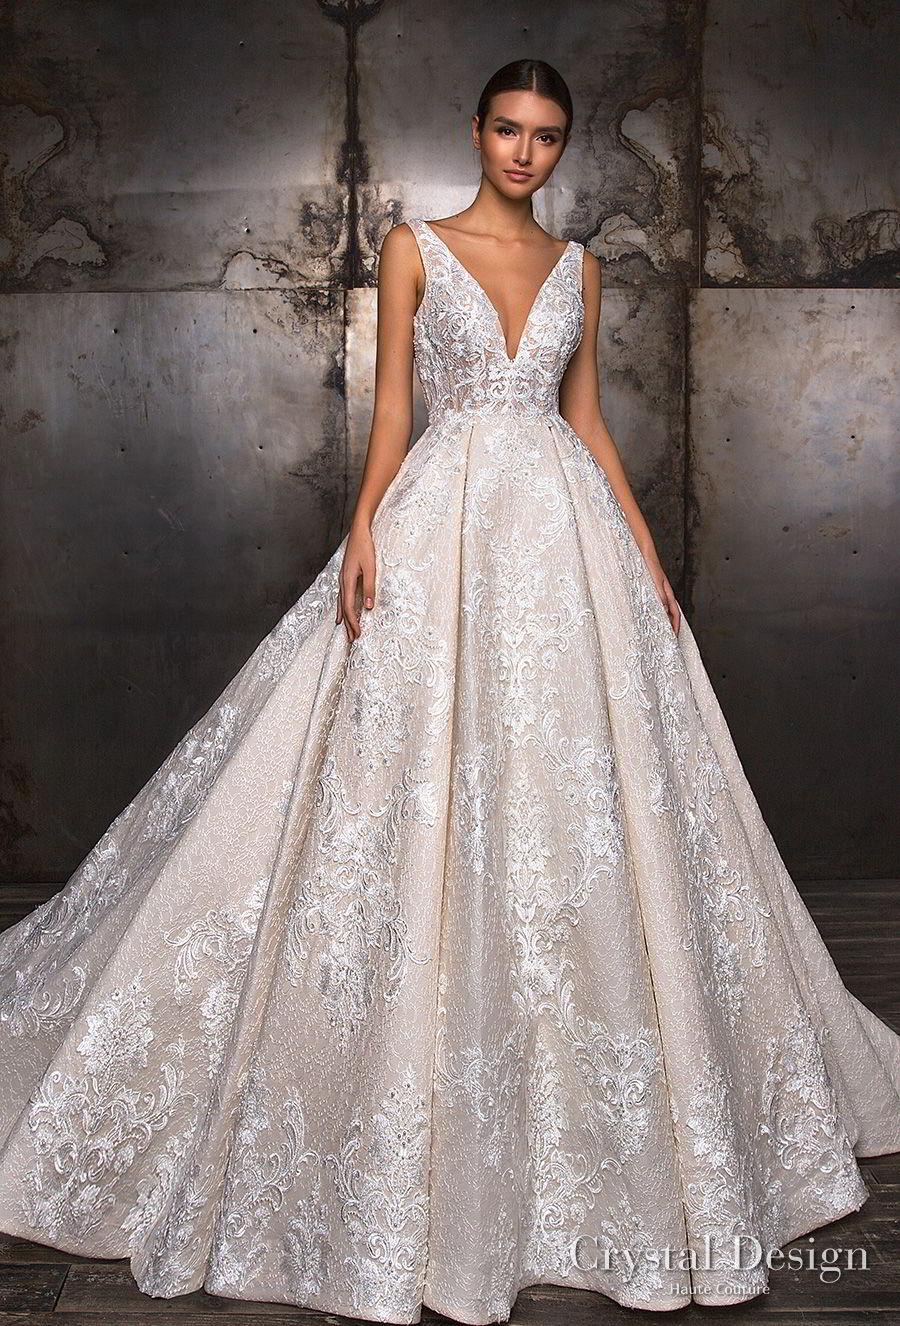 crystal design 2018 sleeveless deep v neck full embellishment princess ball gown a line wedding dress v back royal train (taffi) mv